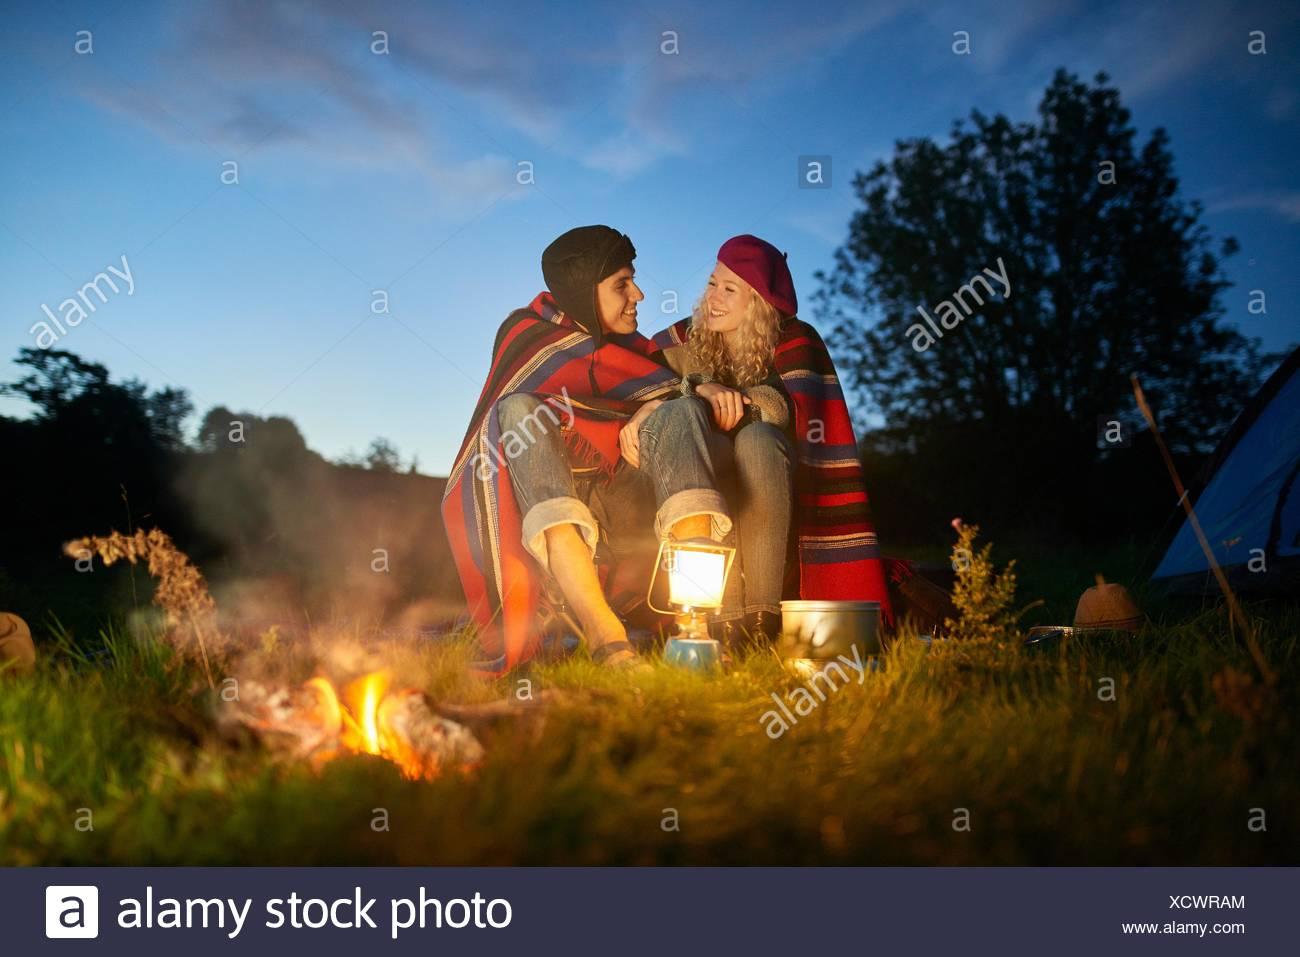 Camping joven pareja sentada por fogata al atardecer Imagen De Stock